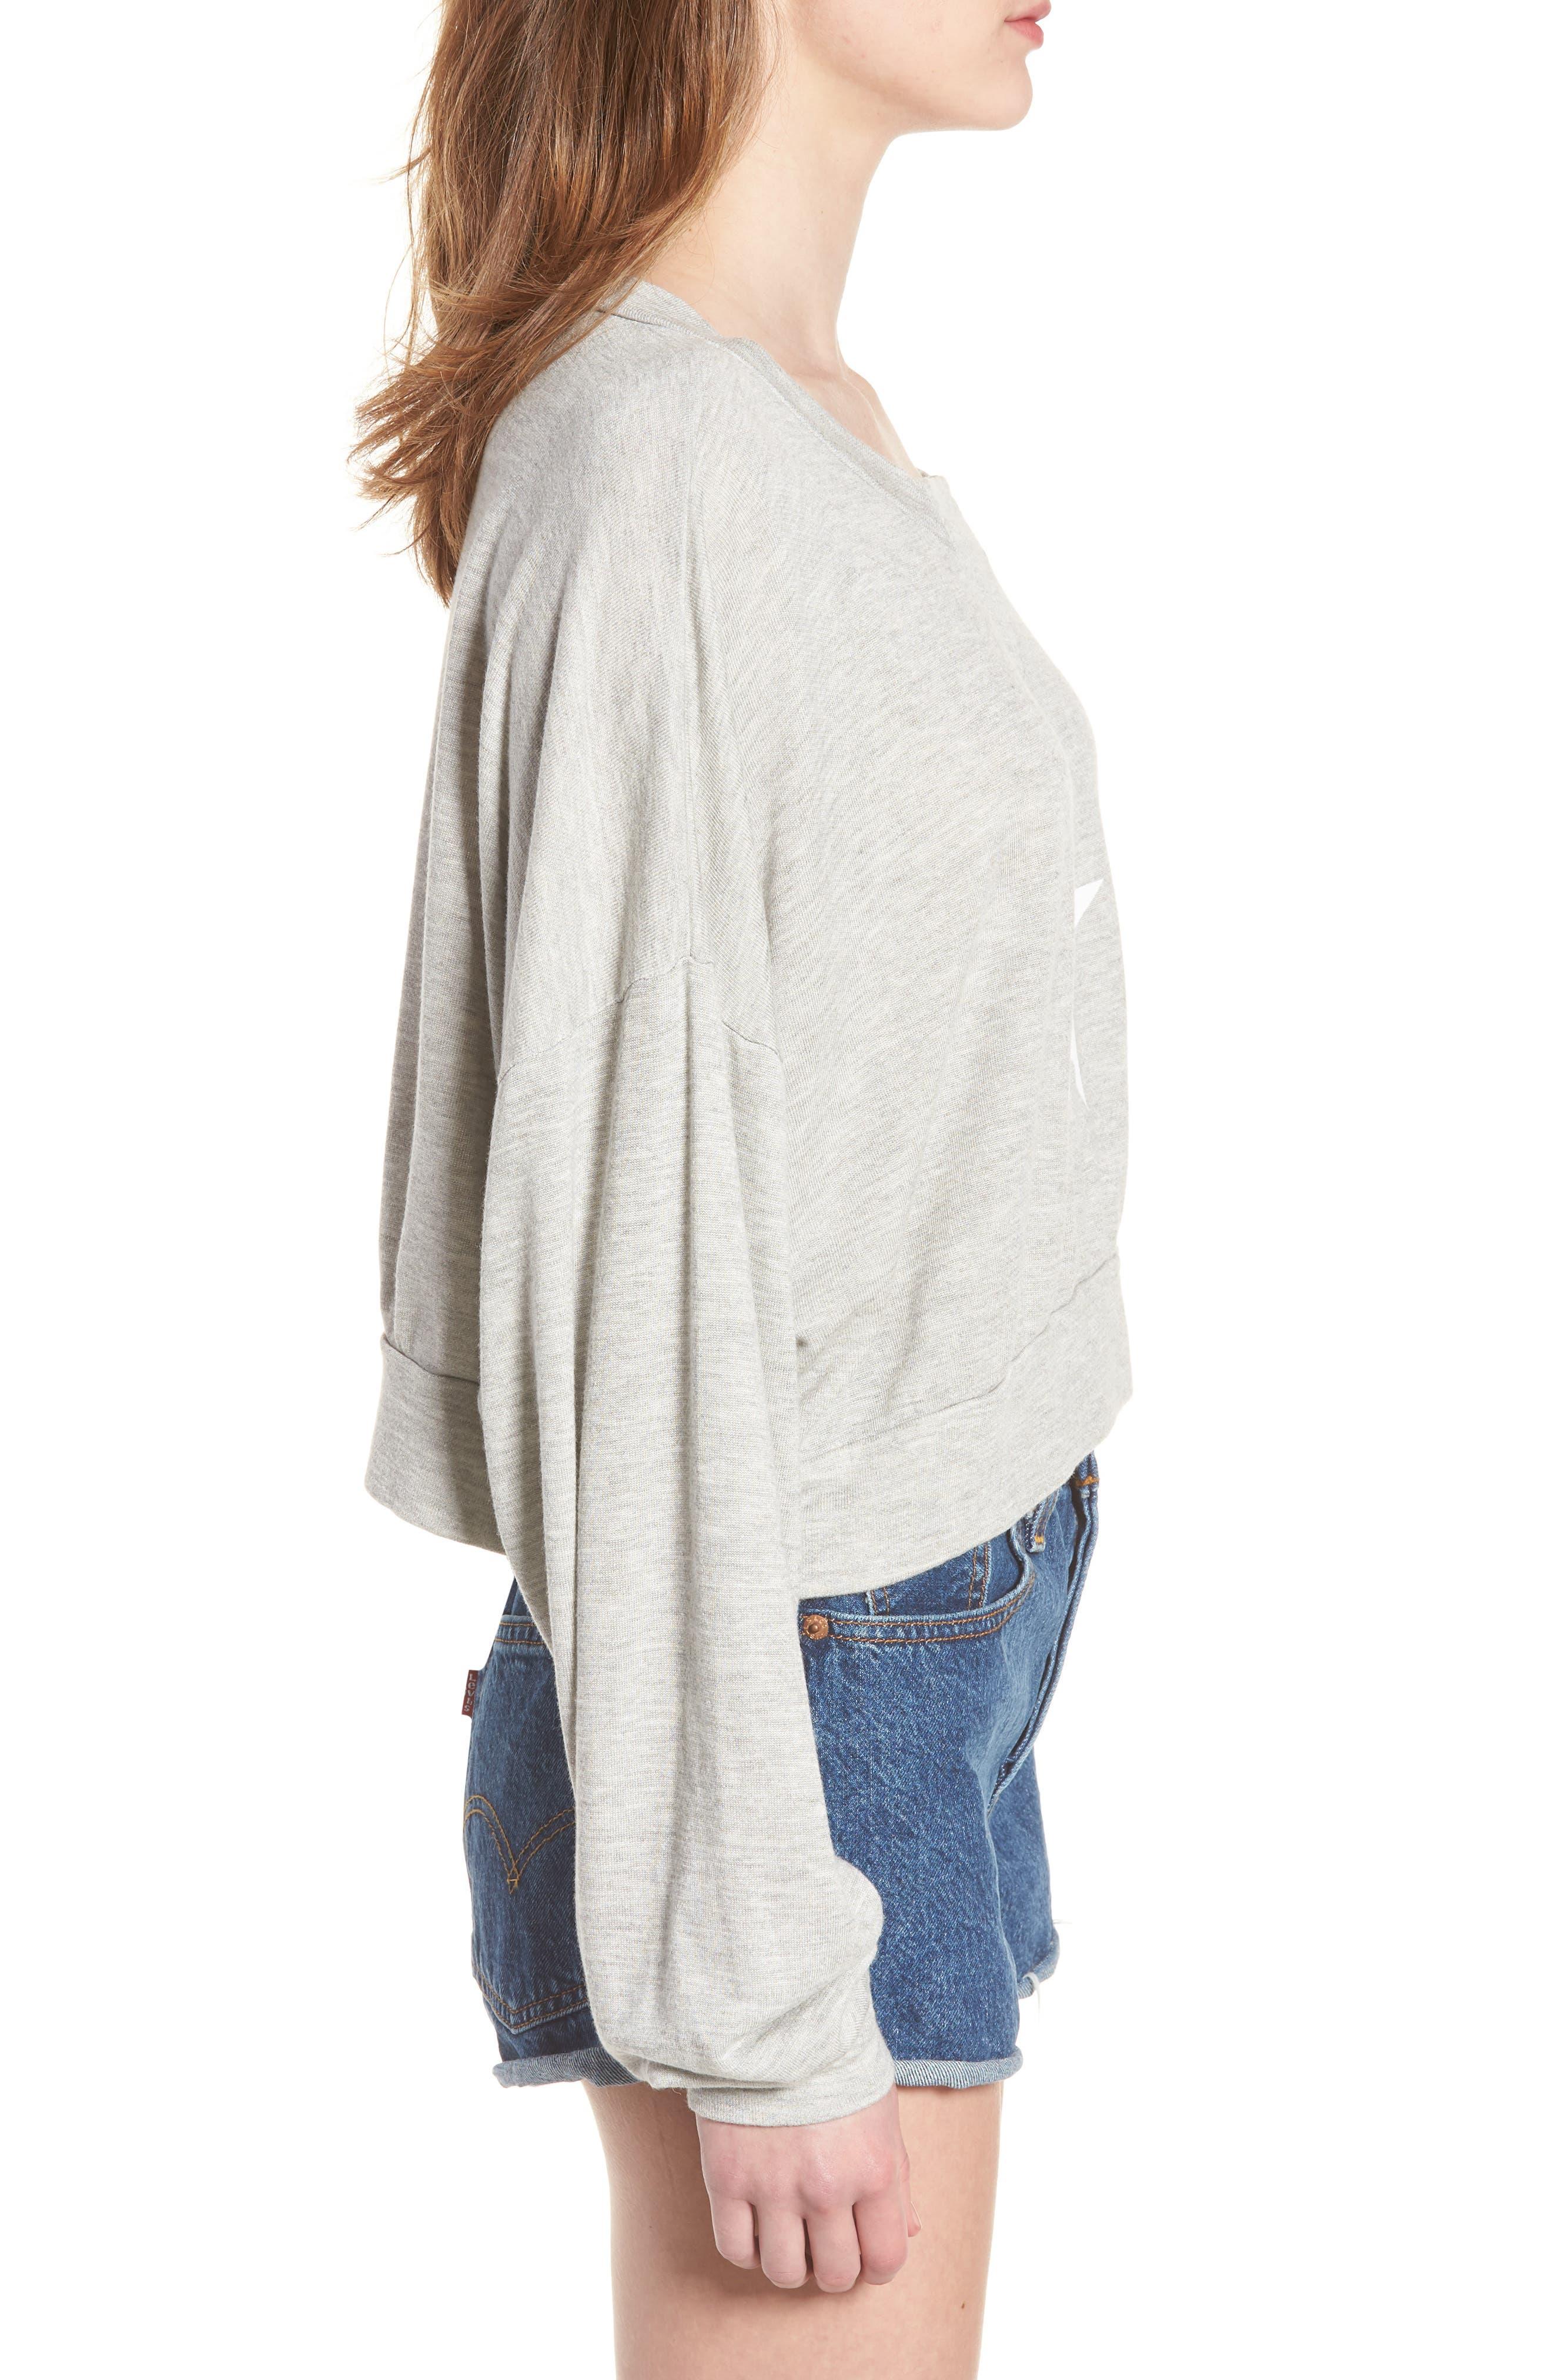 All Star Nella Pullover Sweatshirt,                             Alternate thumbnail 3, color,                             020